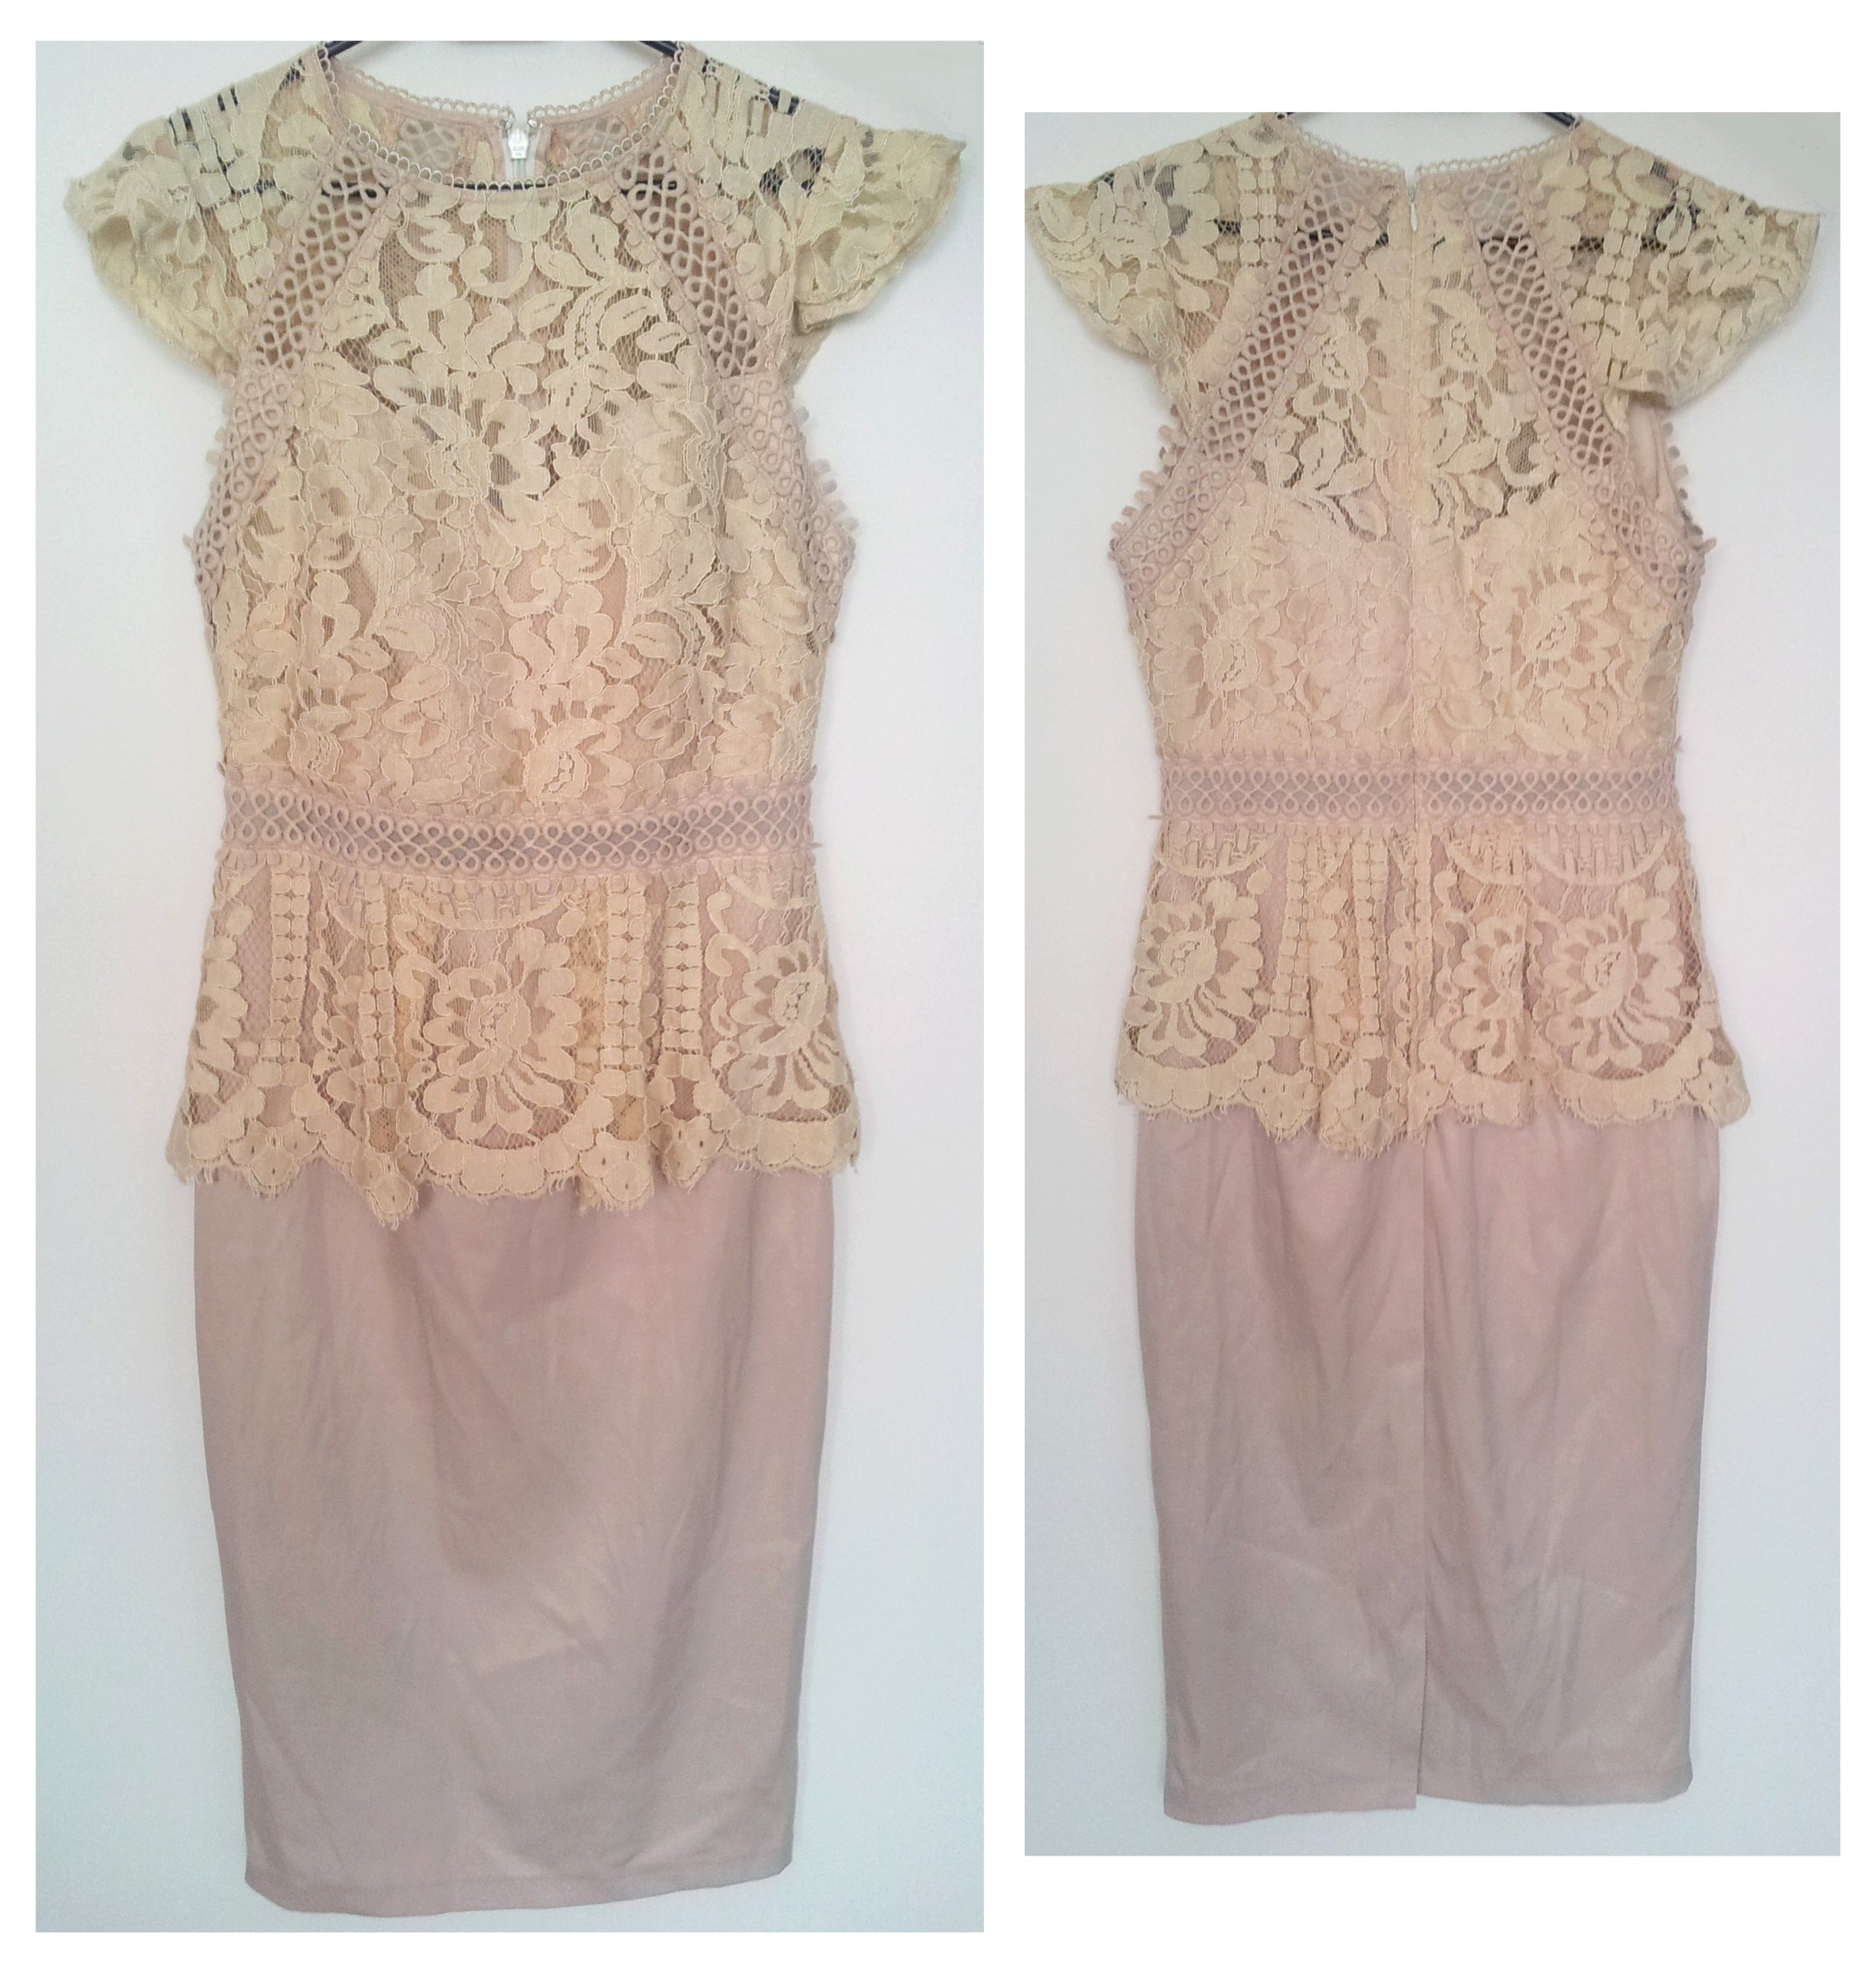 5fe08388c4 LIPSY VIP sukienka koronkowa 36 38 S M - 7396864851 - oficjalne ...